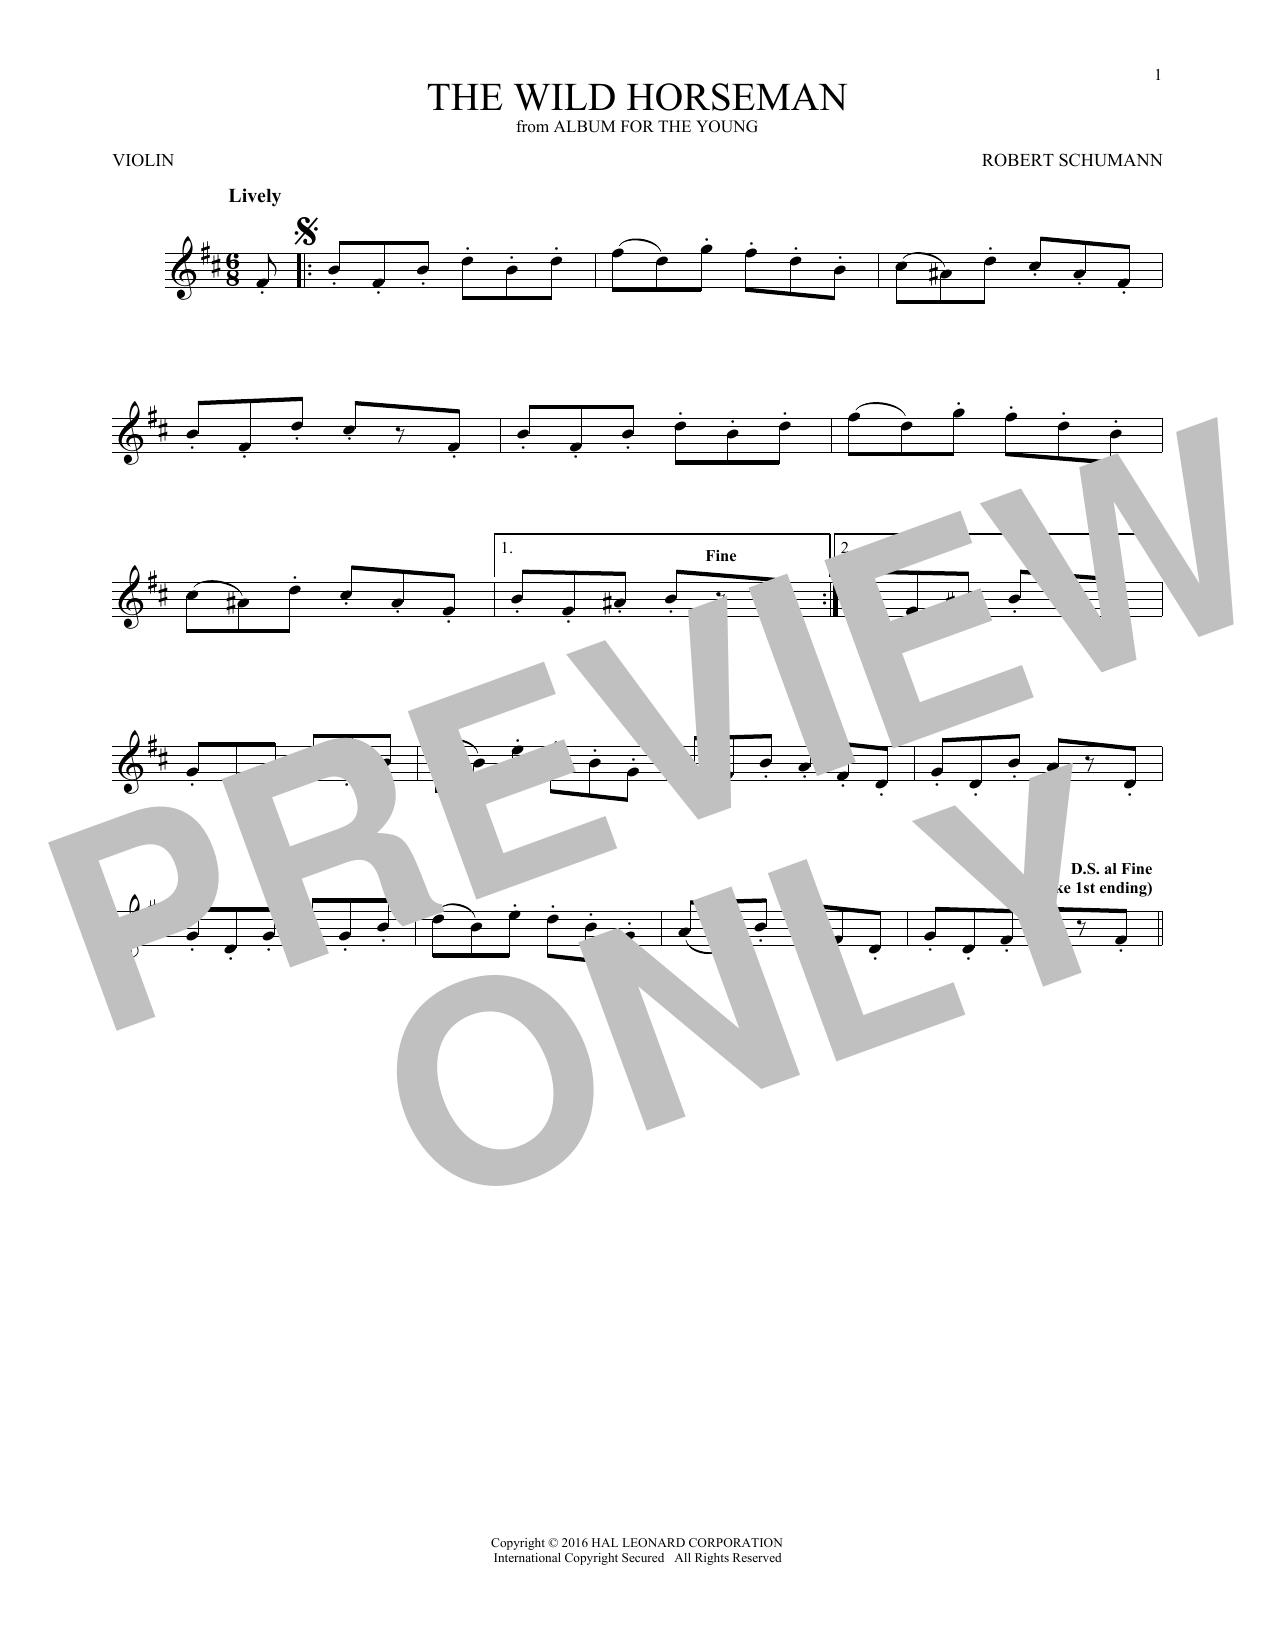 The Wild Horseman (Wilder Reiter), Op. 68, No. 8 (Violin Solo)